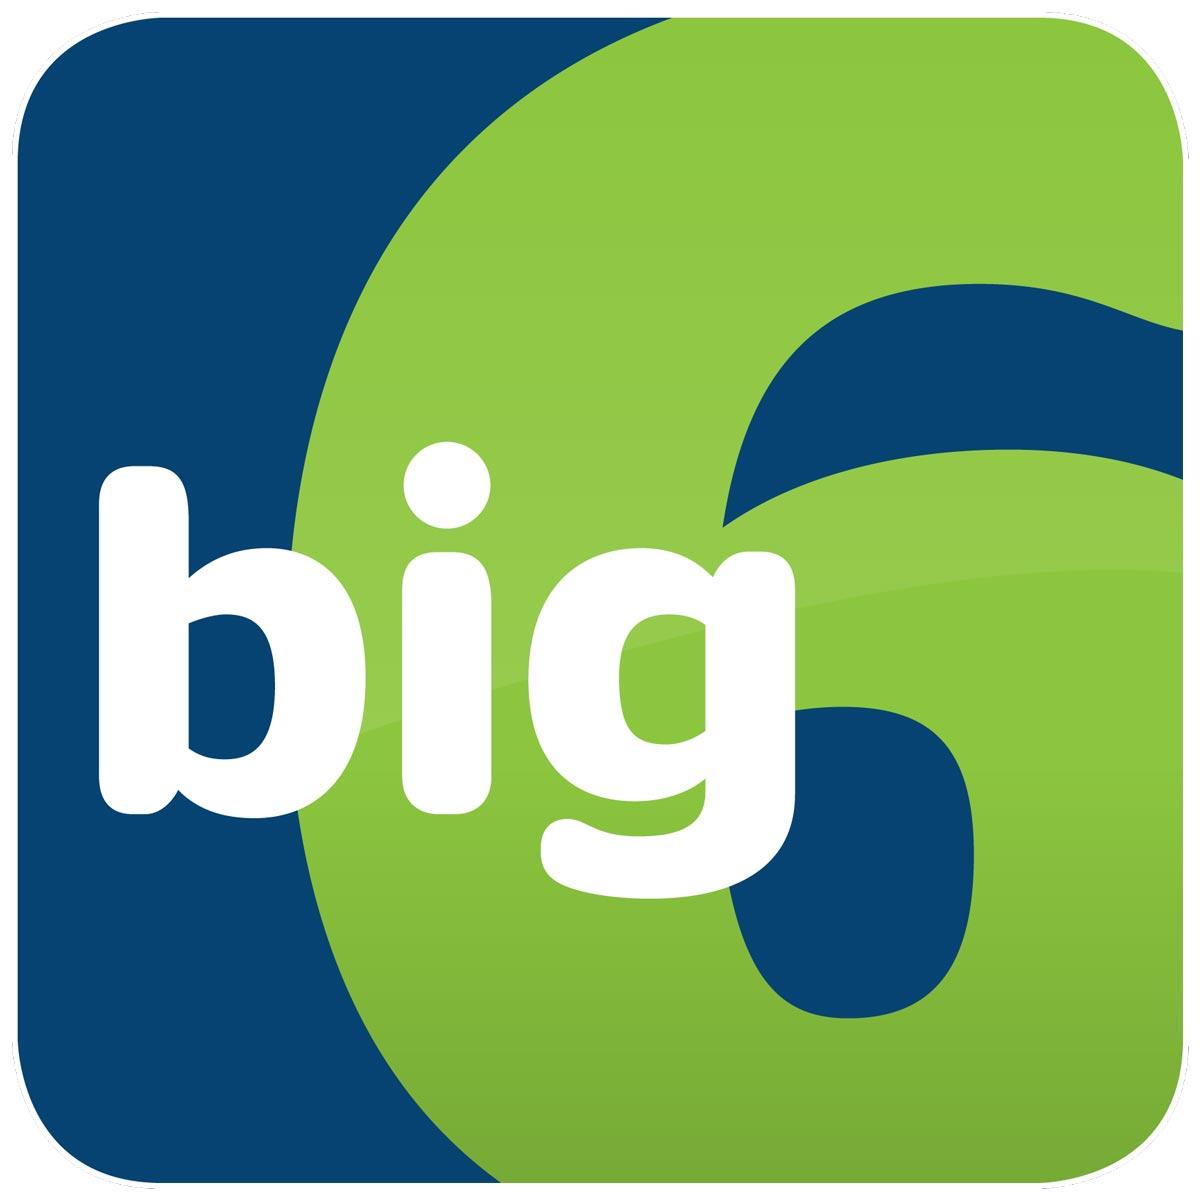 Big 6 logo